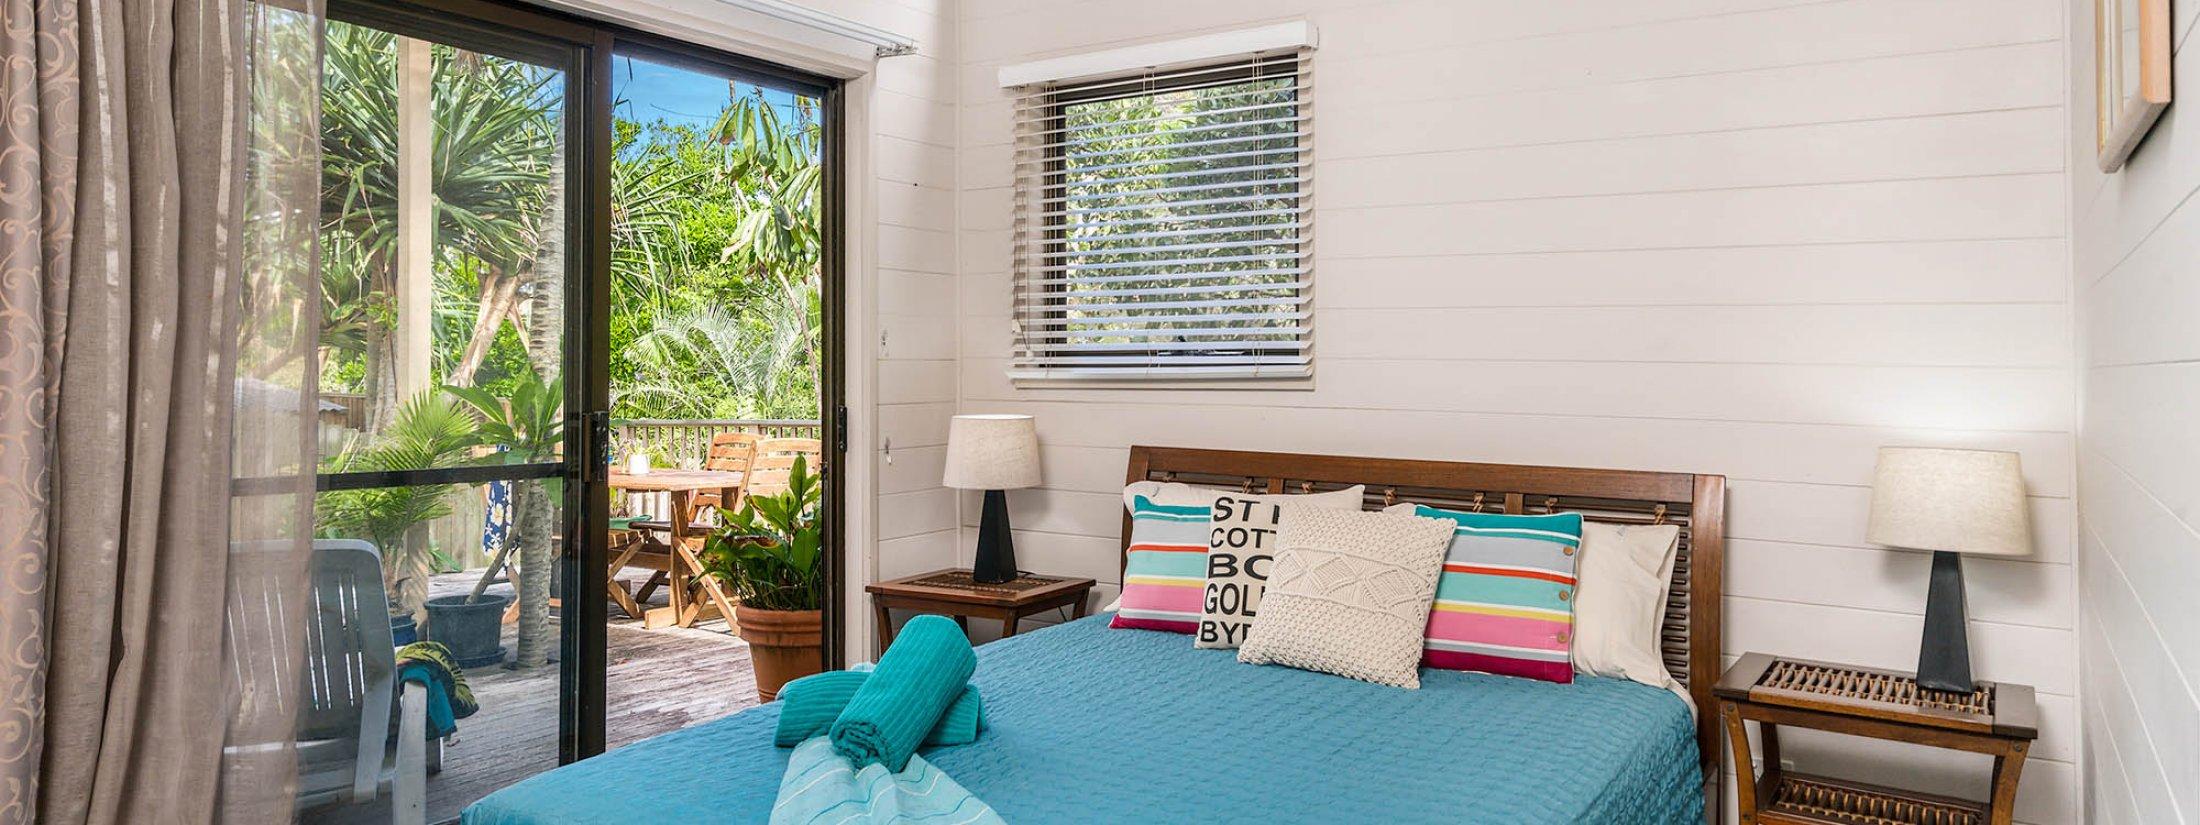 Moonstruck - Byron Bay - Bedroom 2